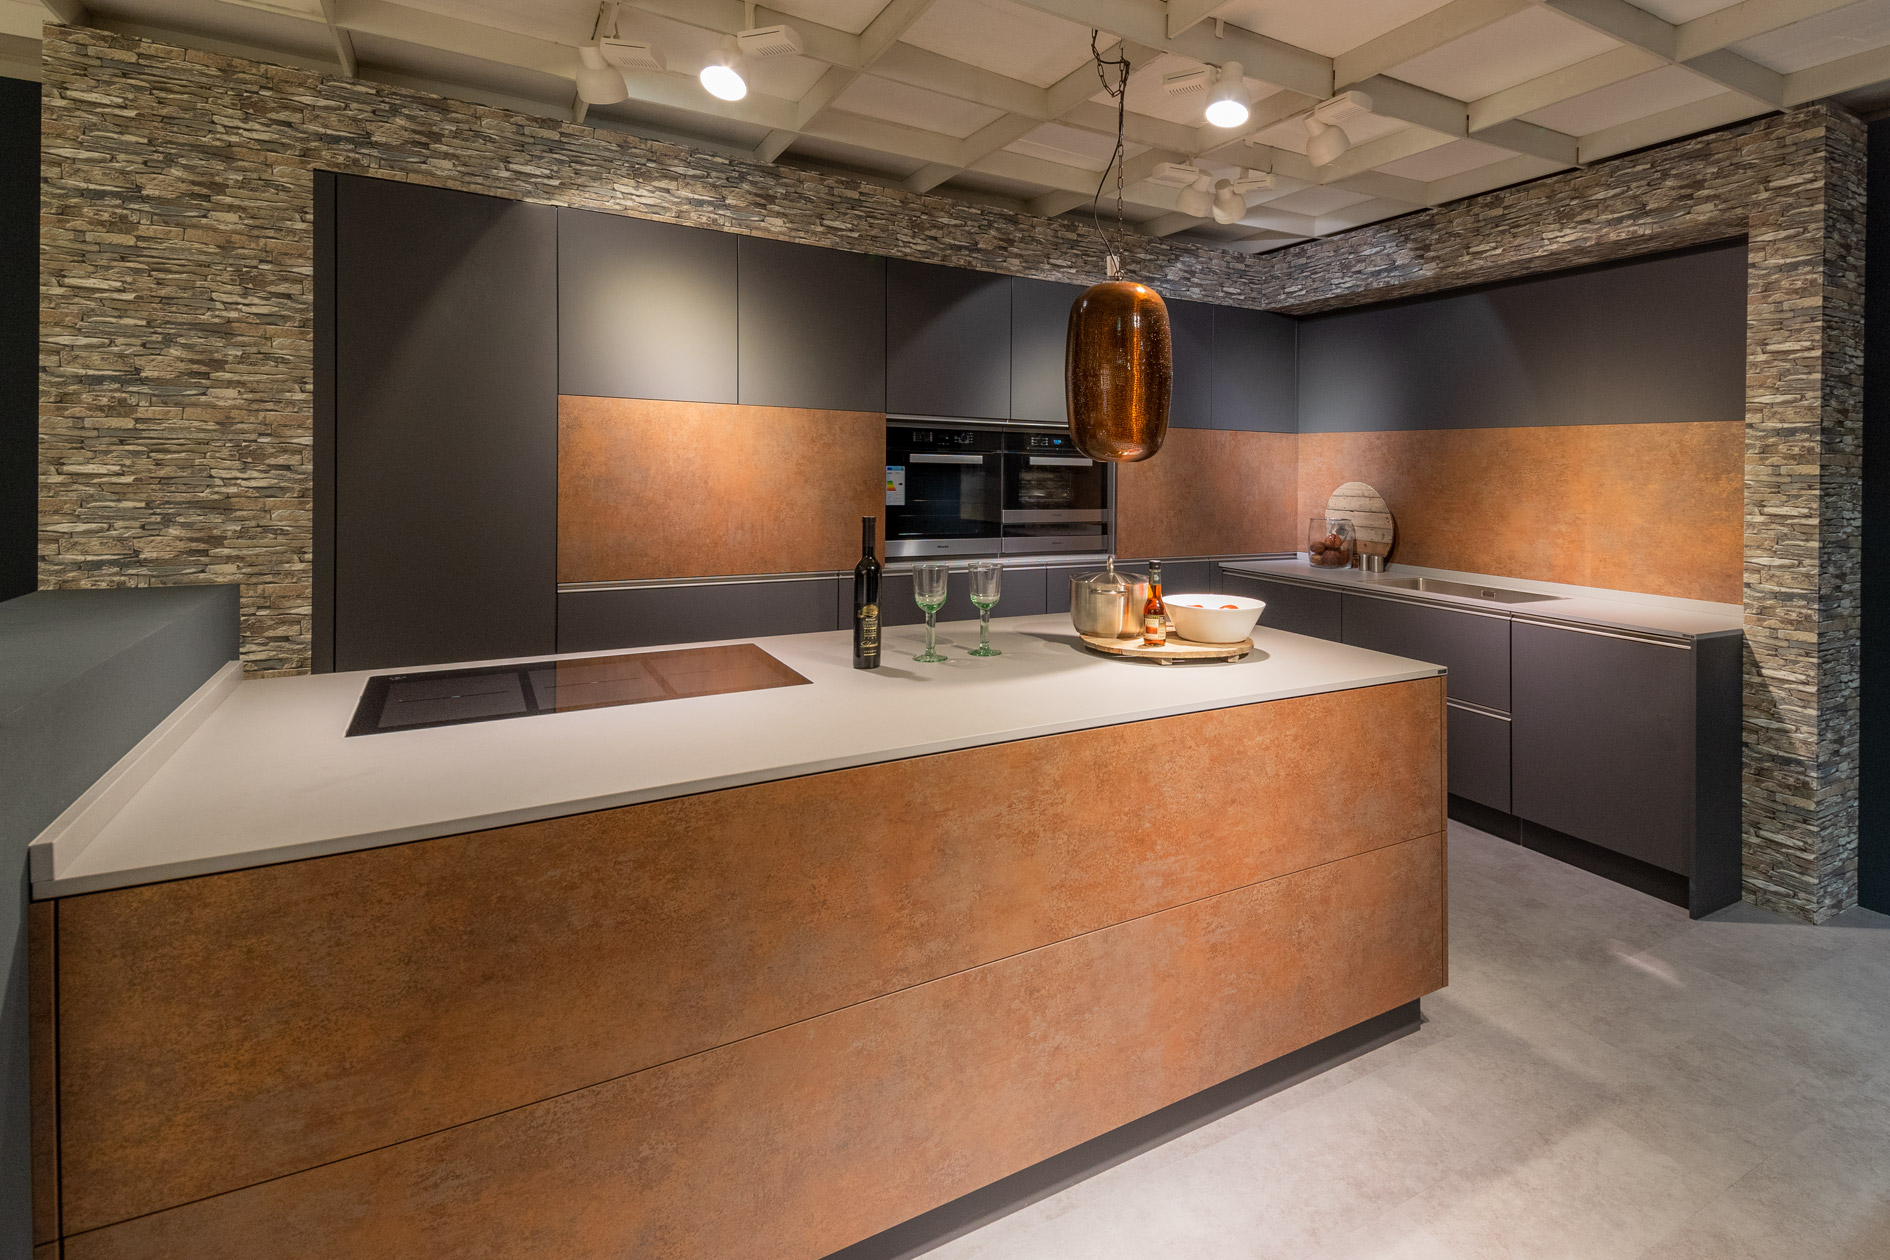 Küche modern und rustikal, Möbelhaus Rivo Fautenbach ...